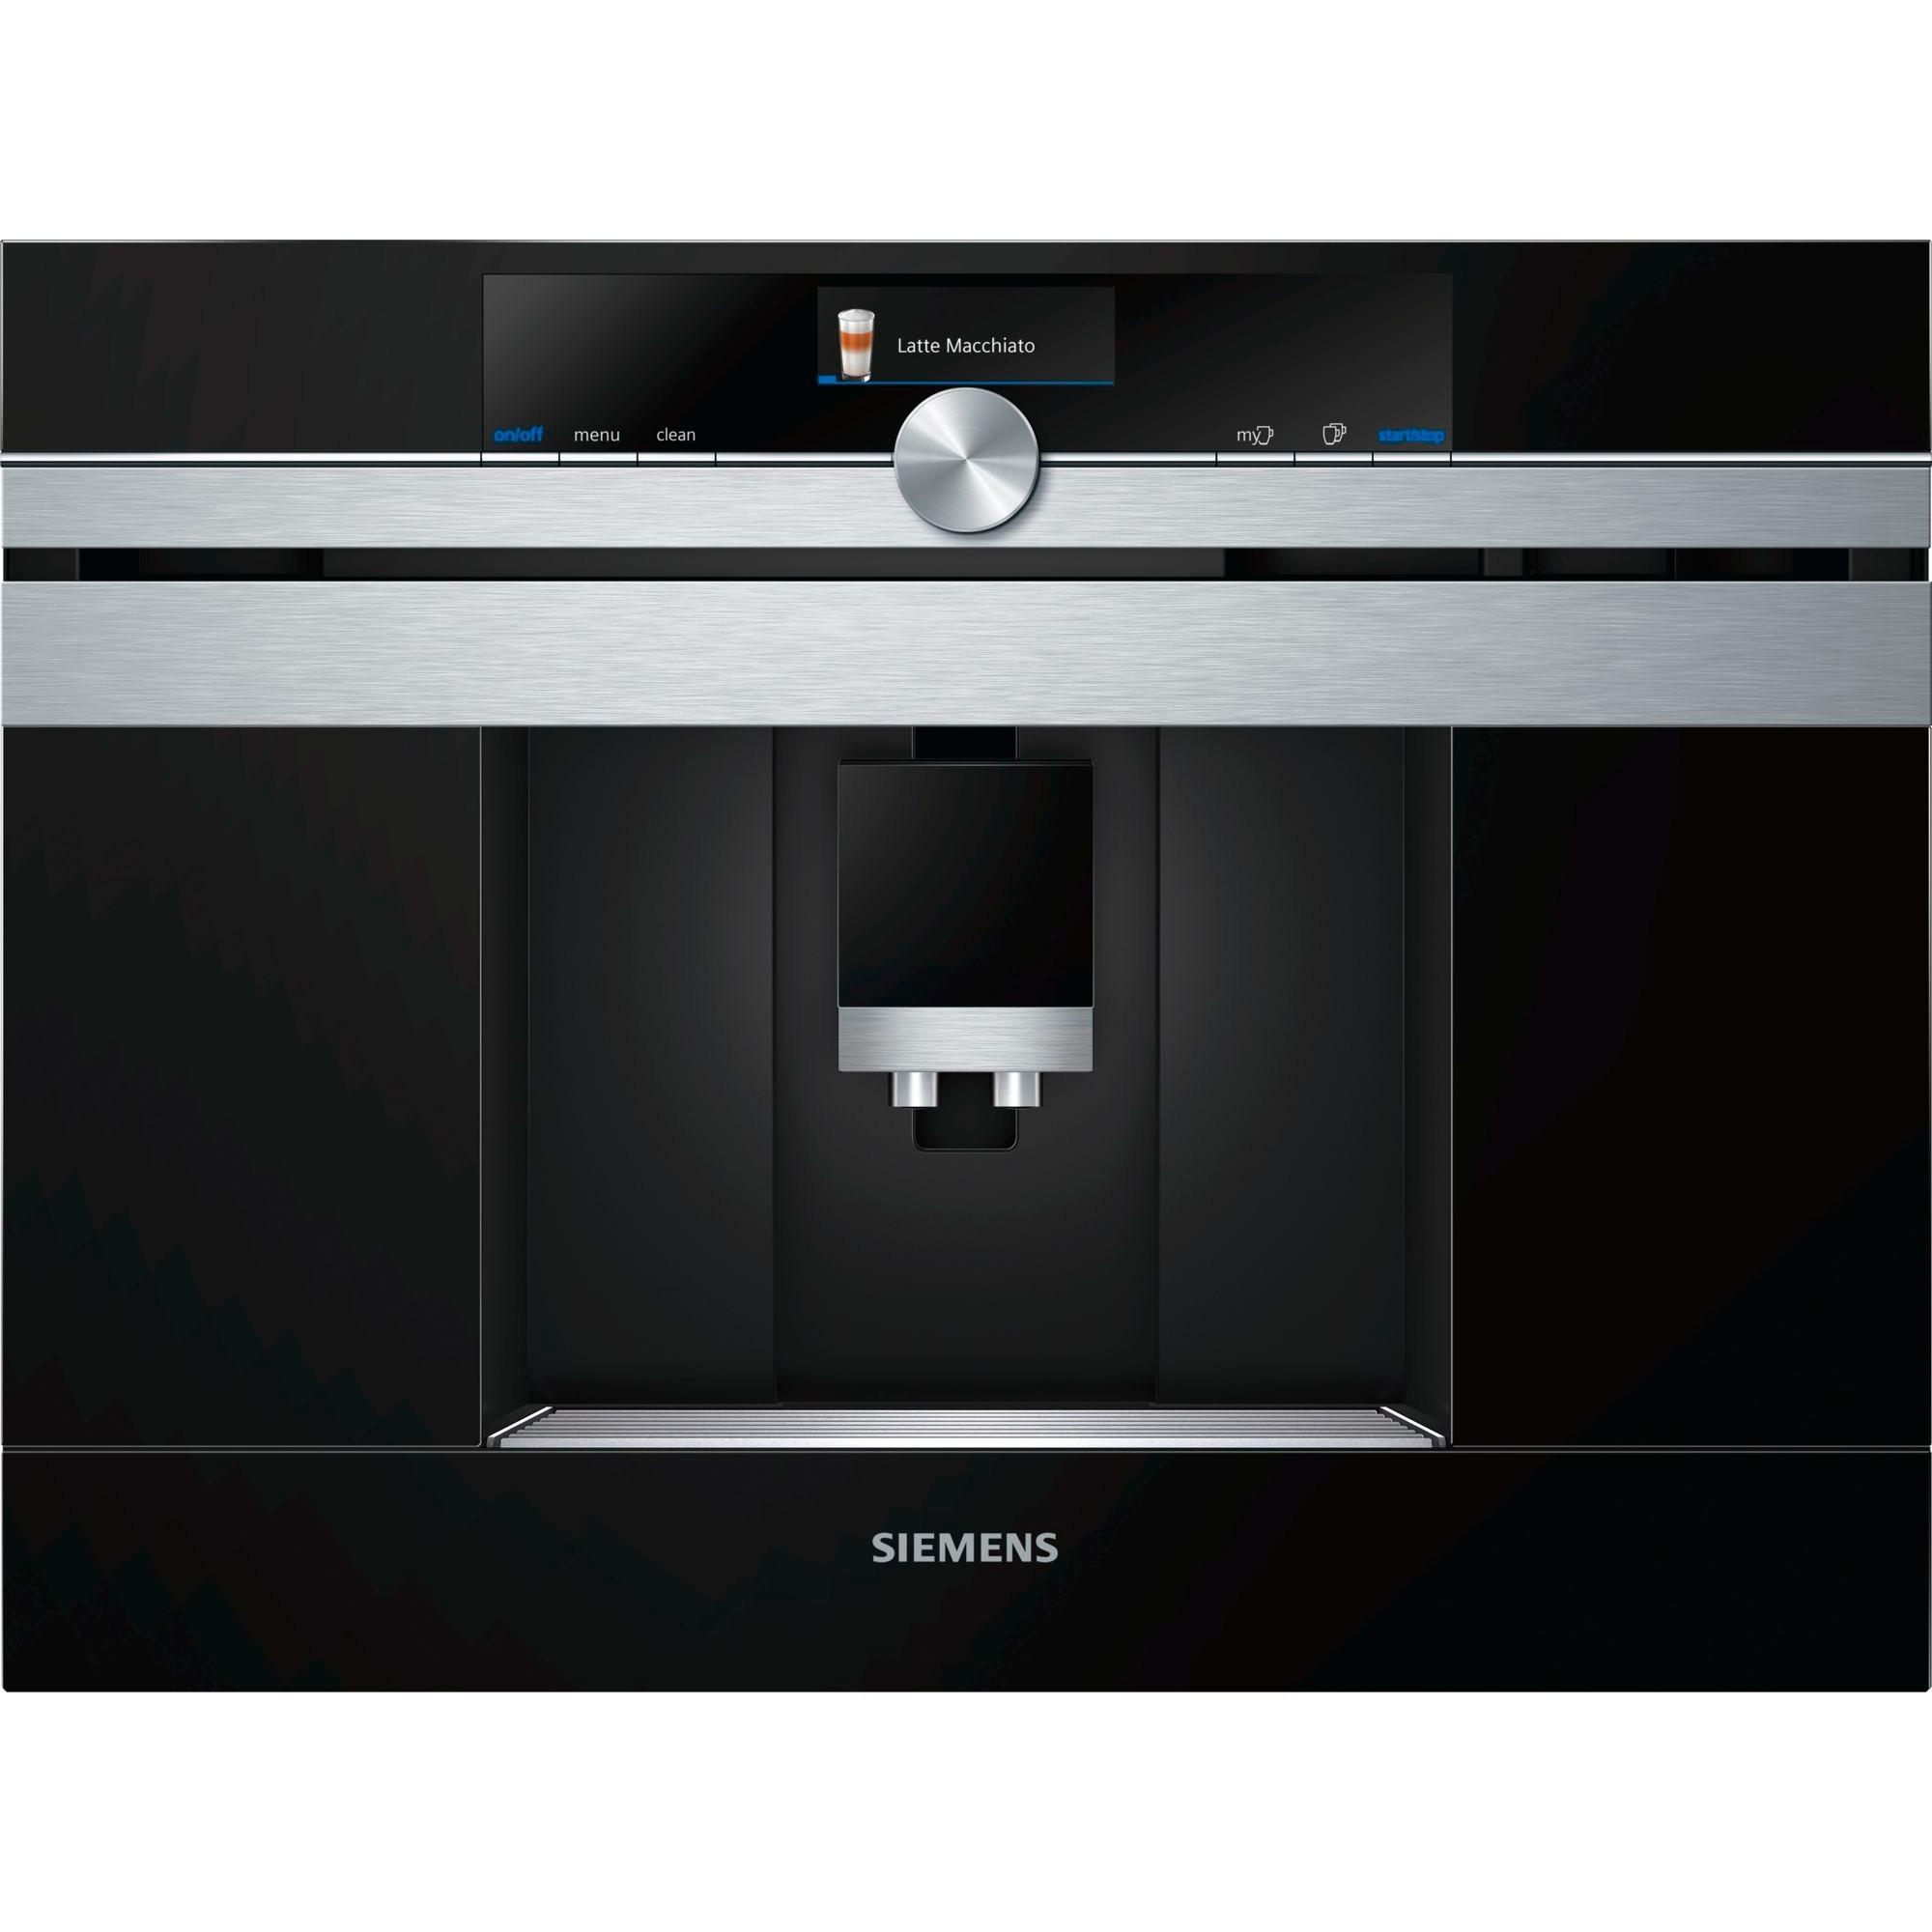 CT636LES1 cafetera eléctrica Integrado Máquina espresso Negro, Acero inoxidable 2,4 L 1 tazas Totalmente automática, Superautomática